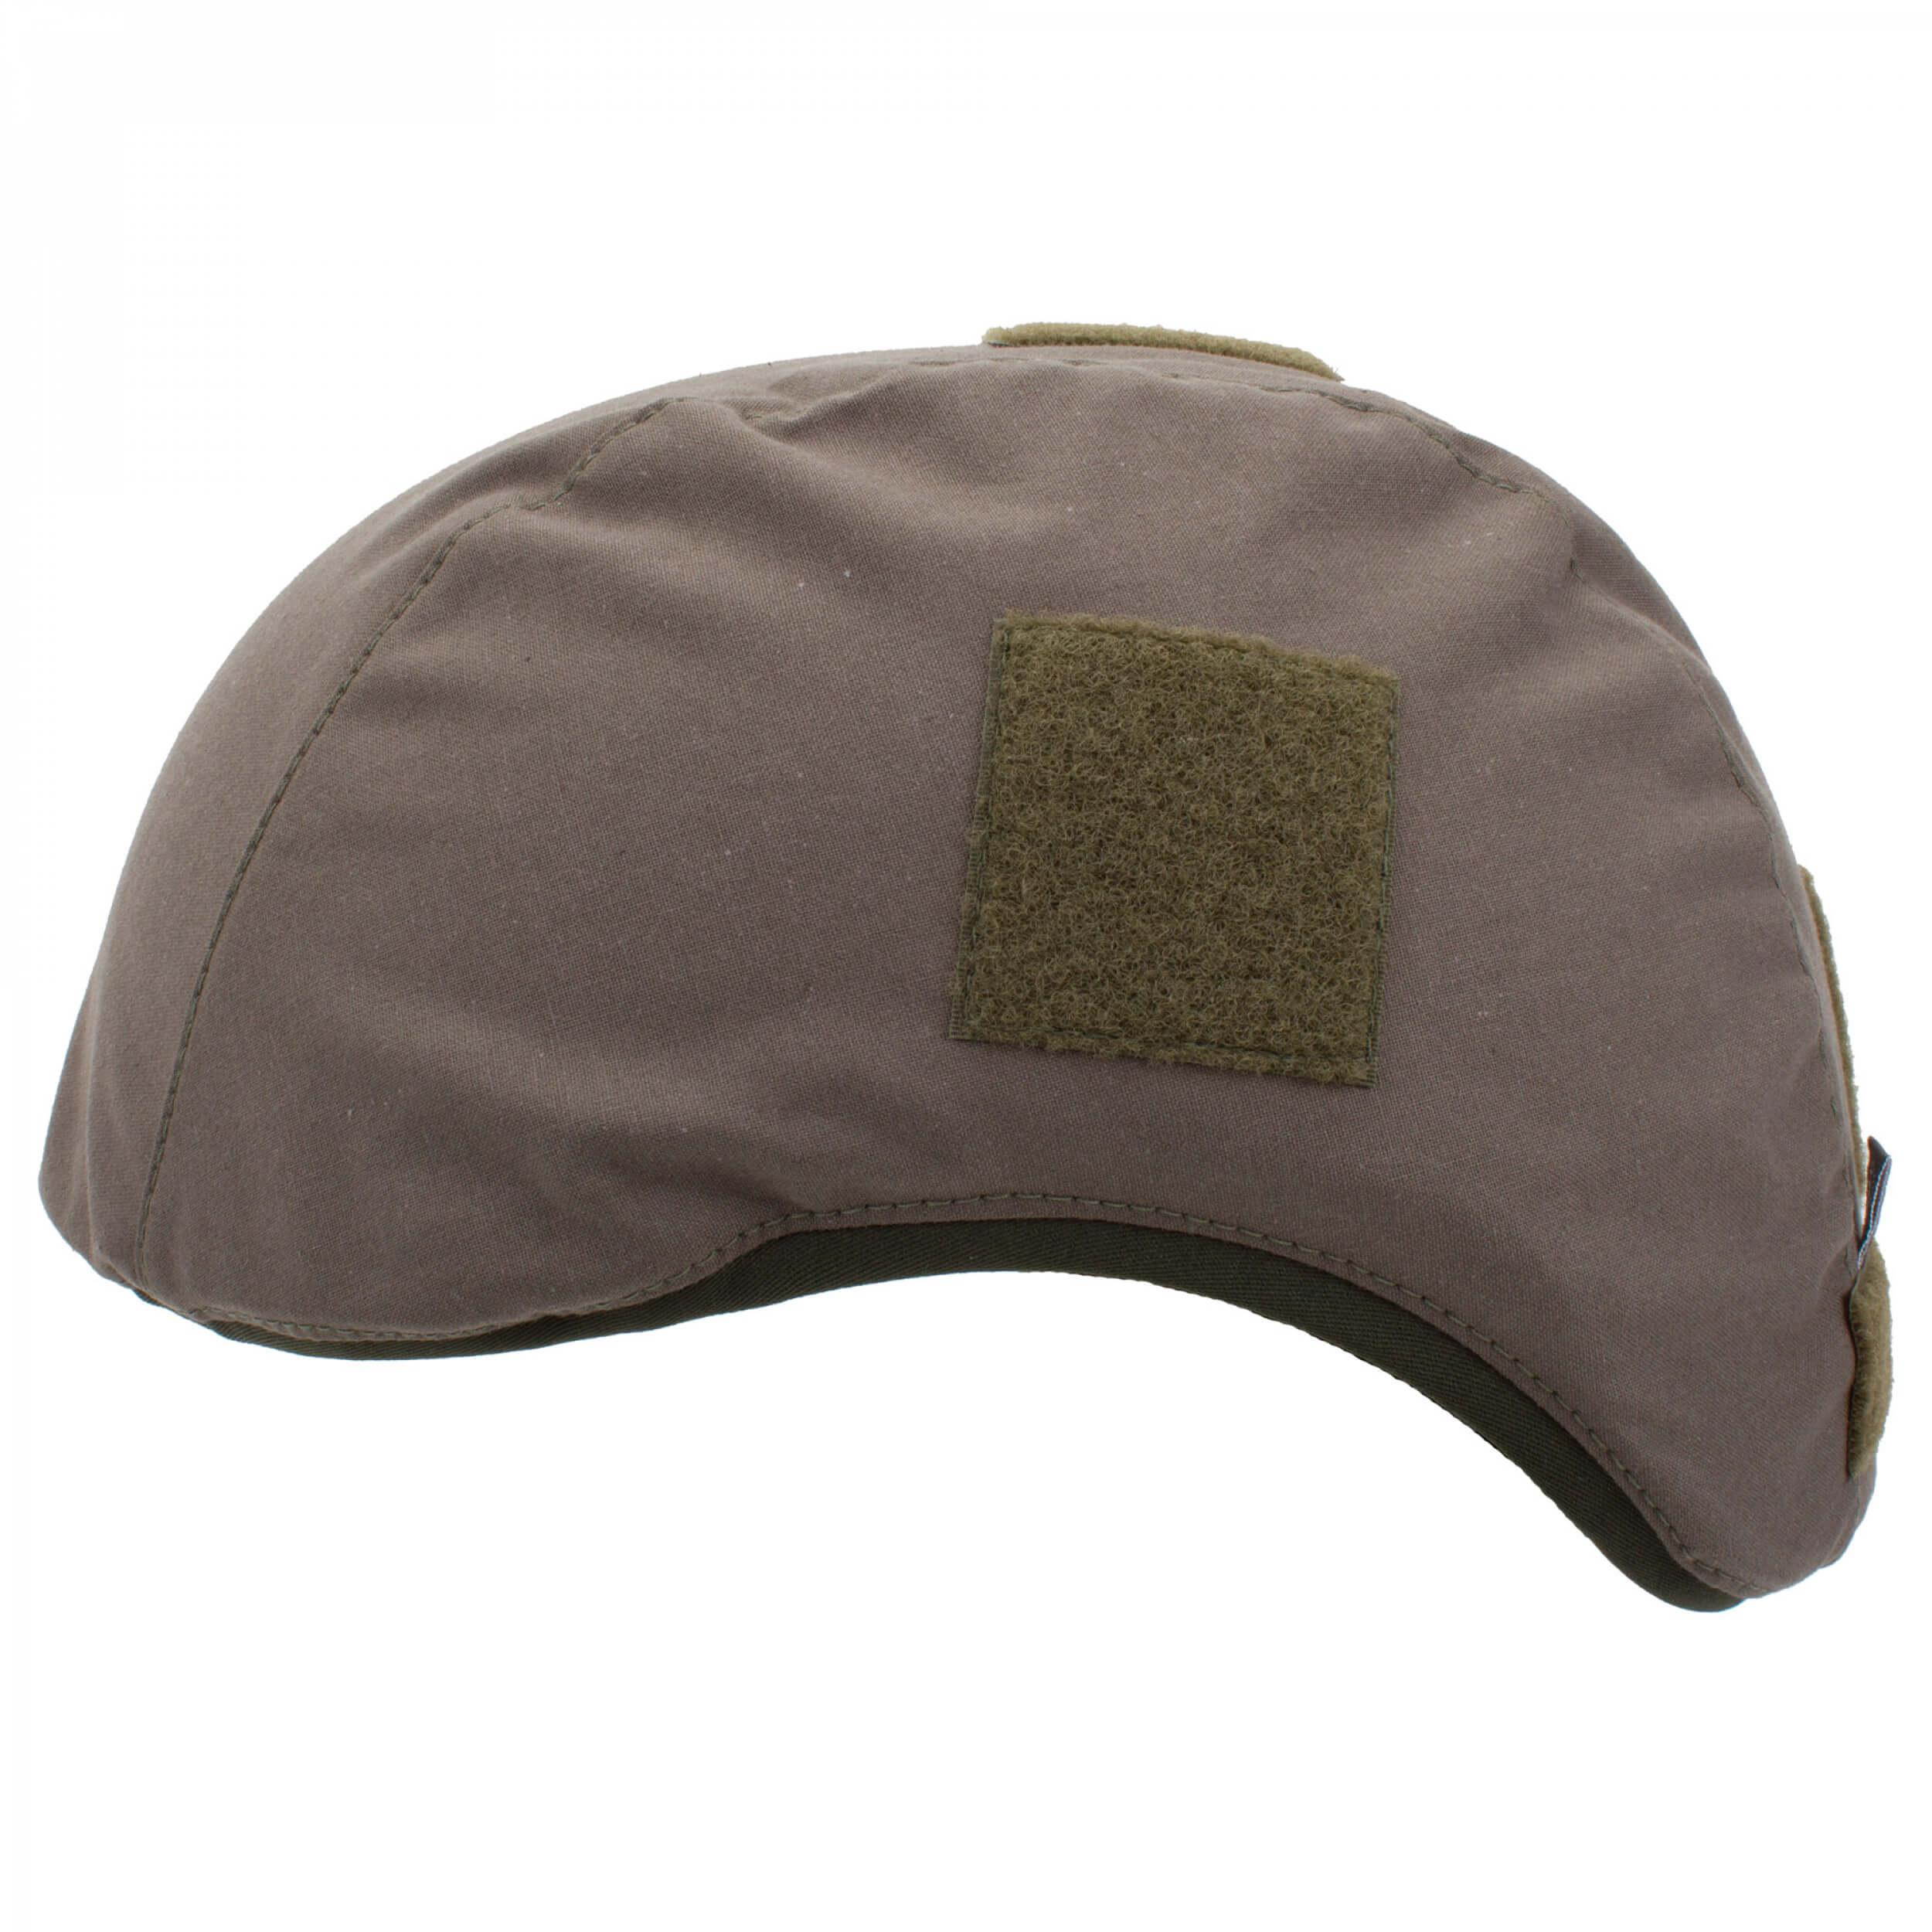 HCS Special Forces Helmbezug oliv drab